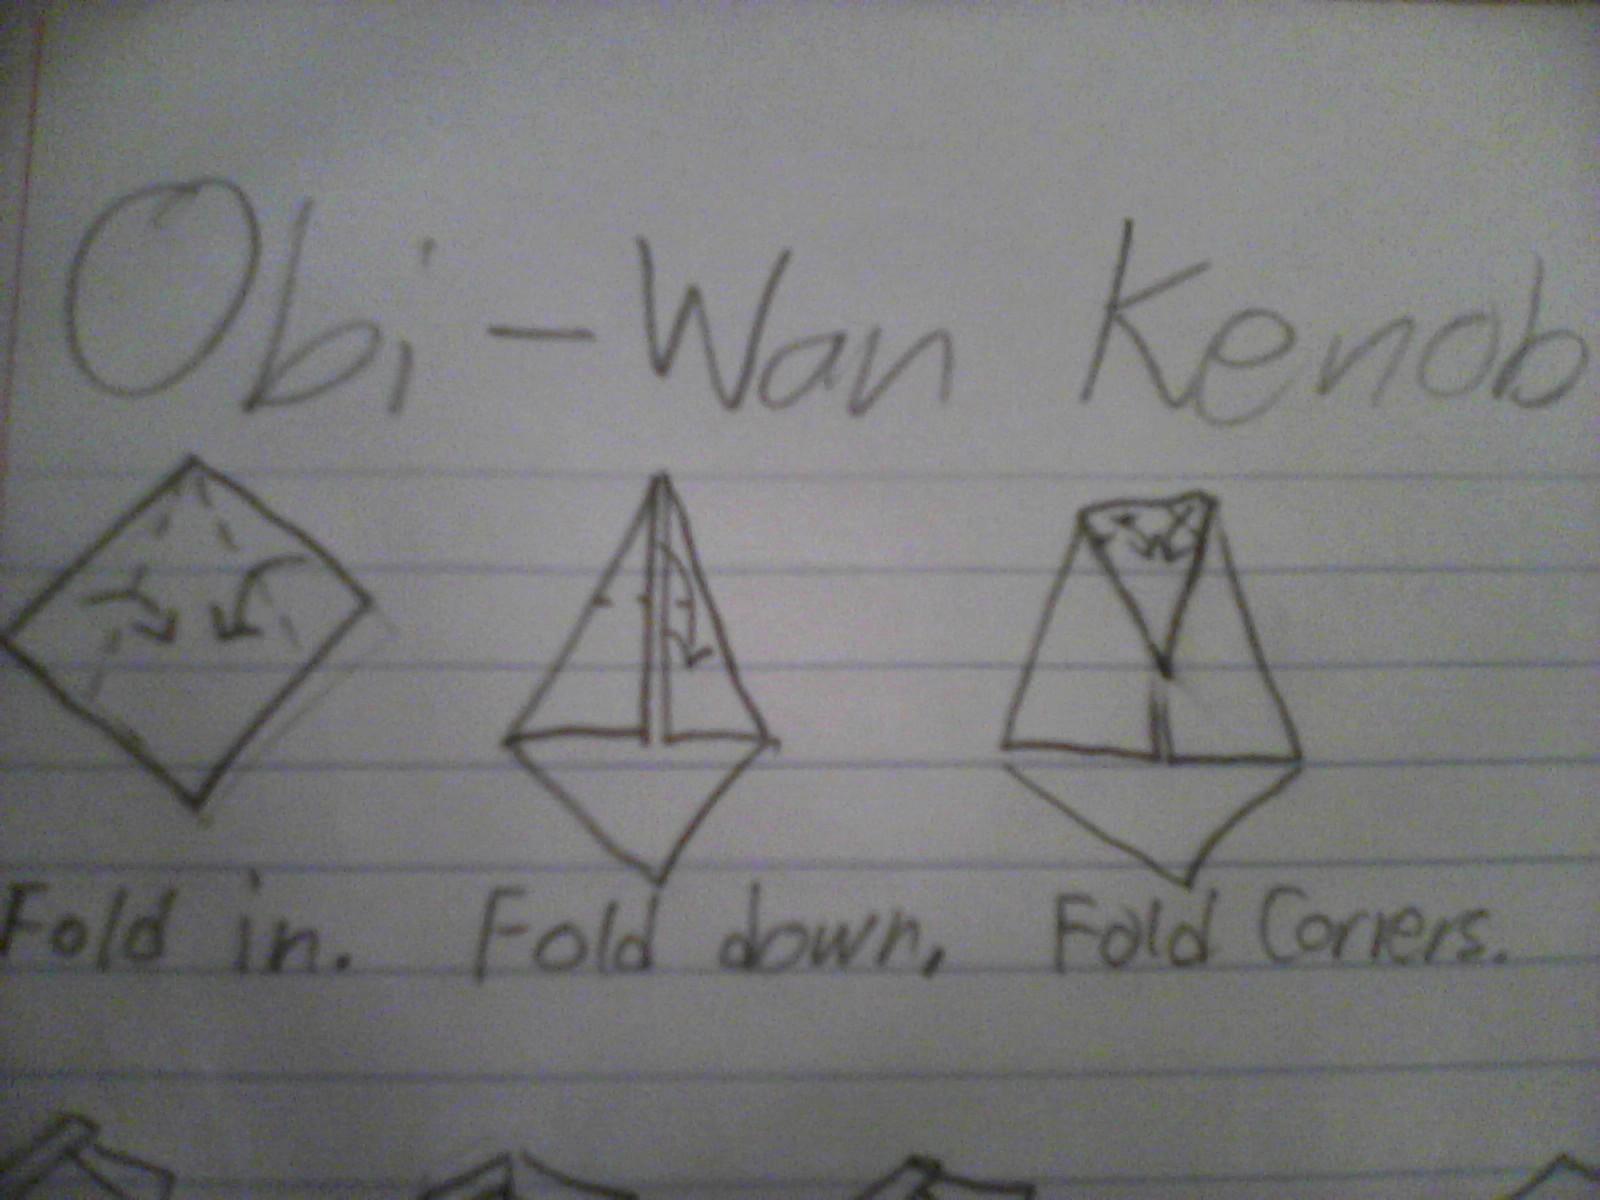 Origami obi wan kenobi instructions